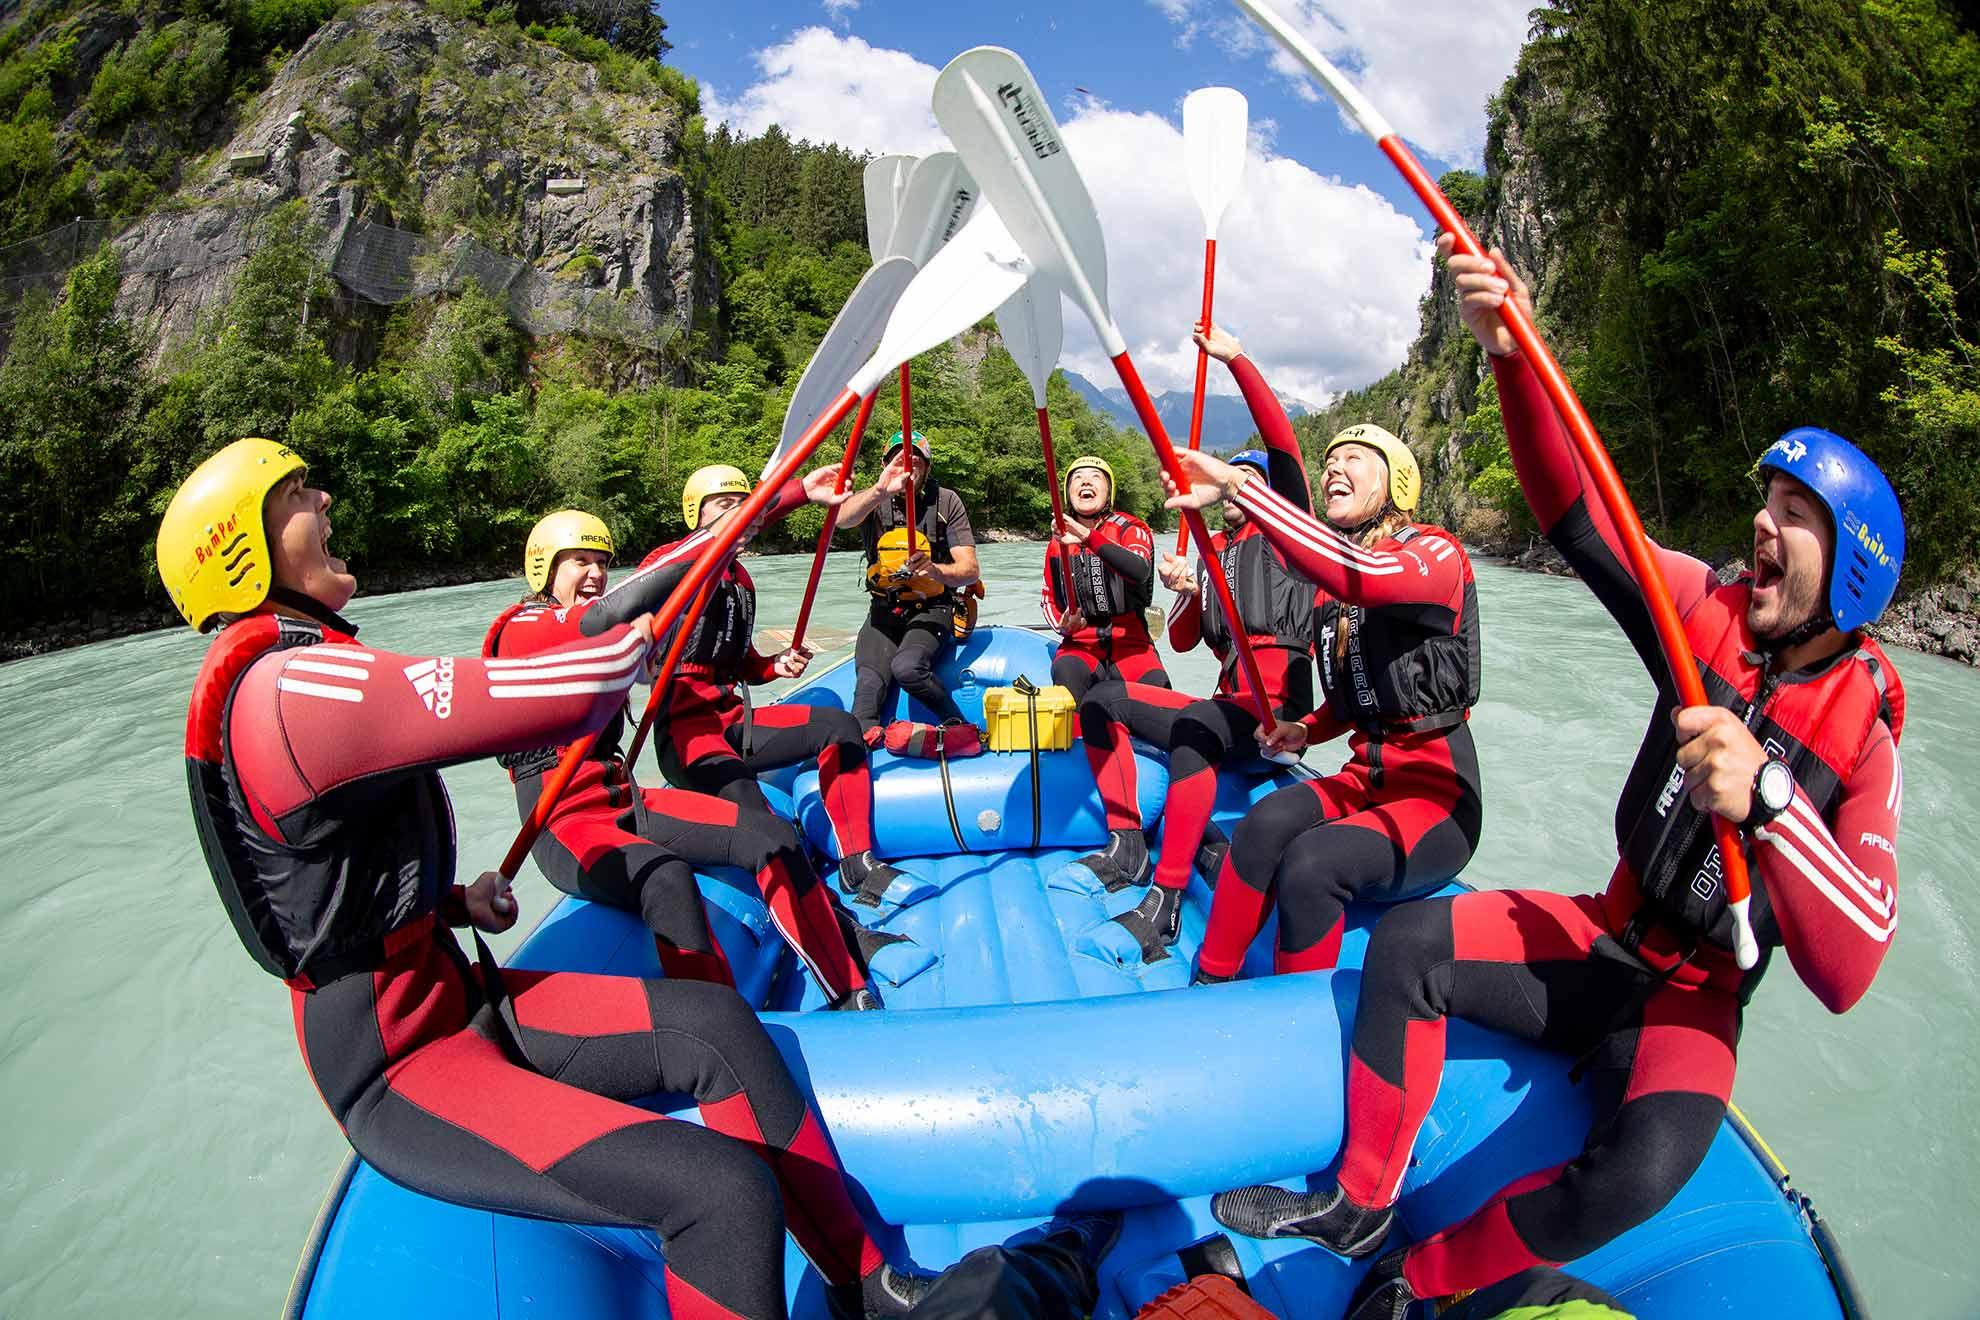 Teambuilding Events in Tirol